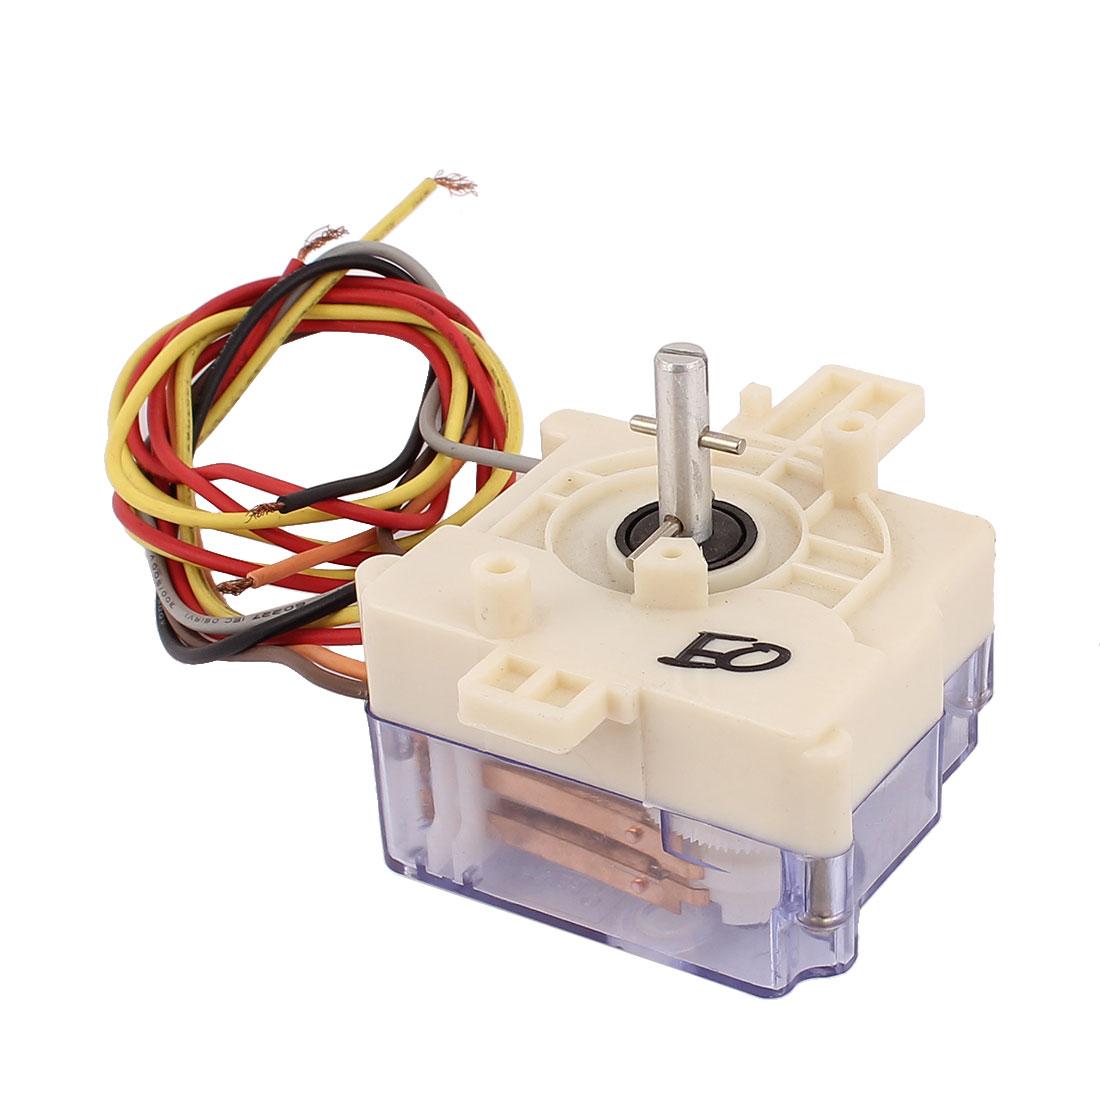 AC 220V 3A 6 Wires 90 Degree Rotary Shaft Washing Machine Washer Timer